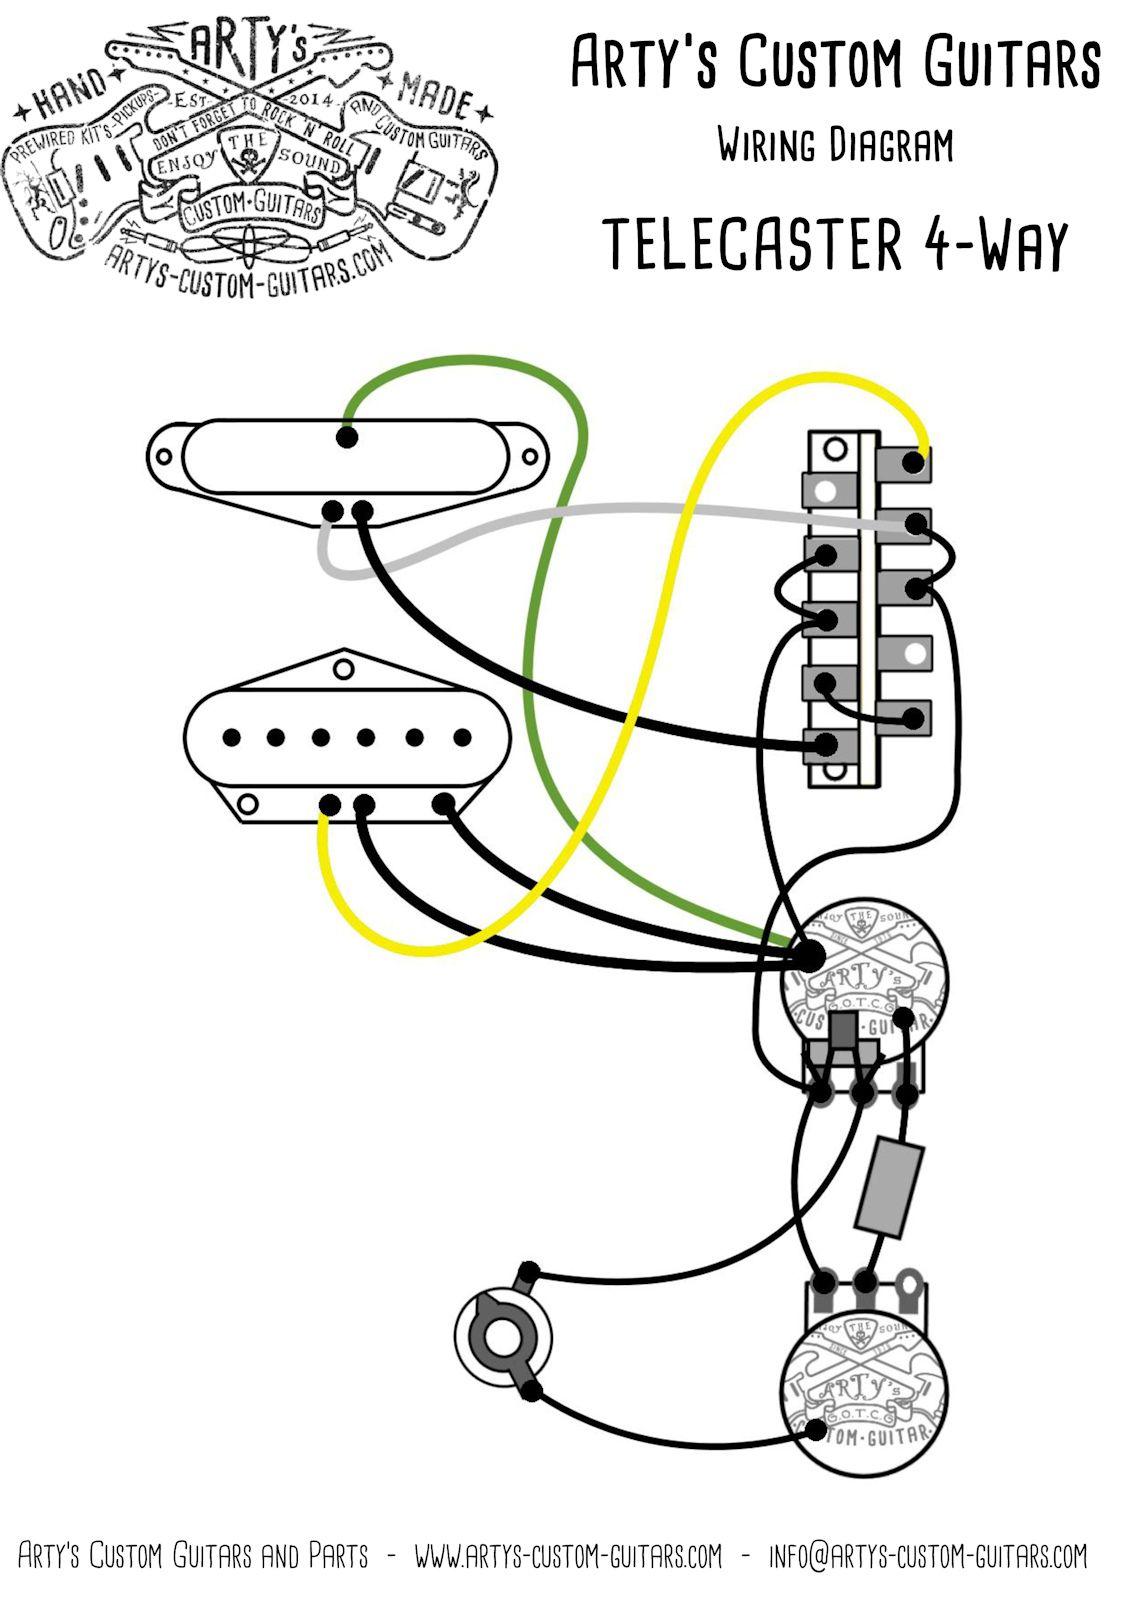 medium resolution of arty s custom guitars wiring diagram plan telecaster assembly harness tele